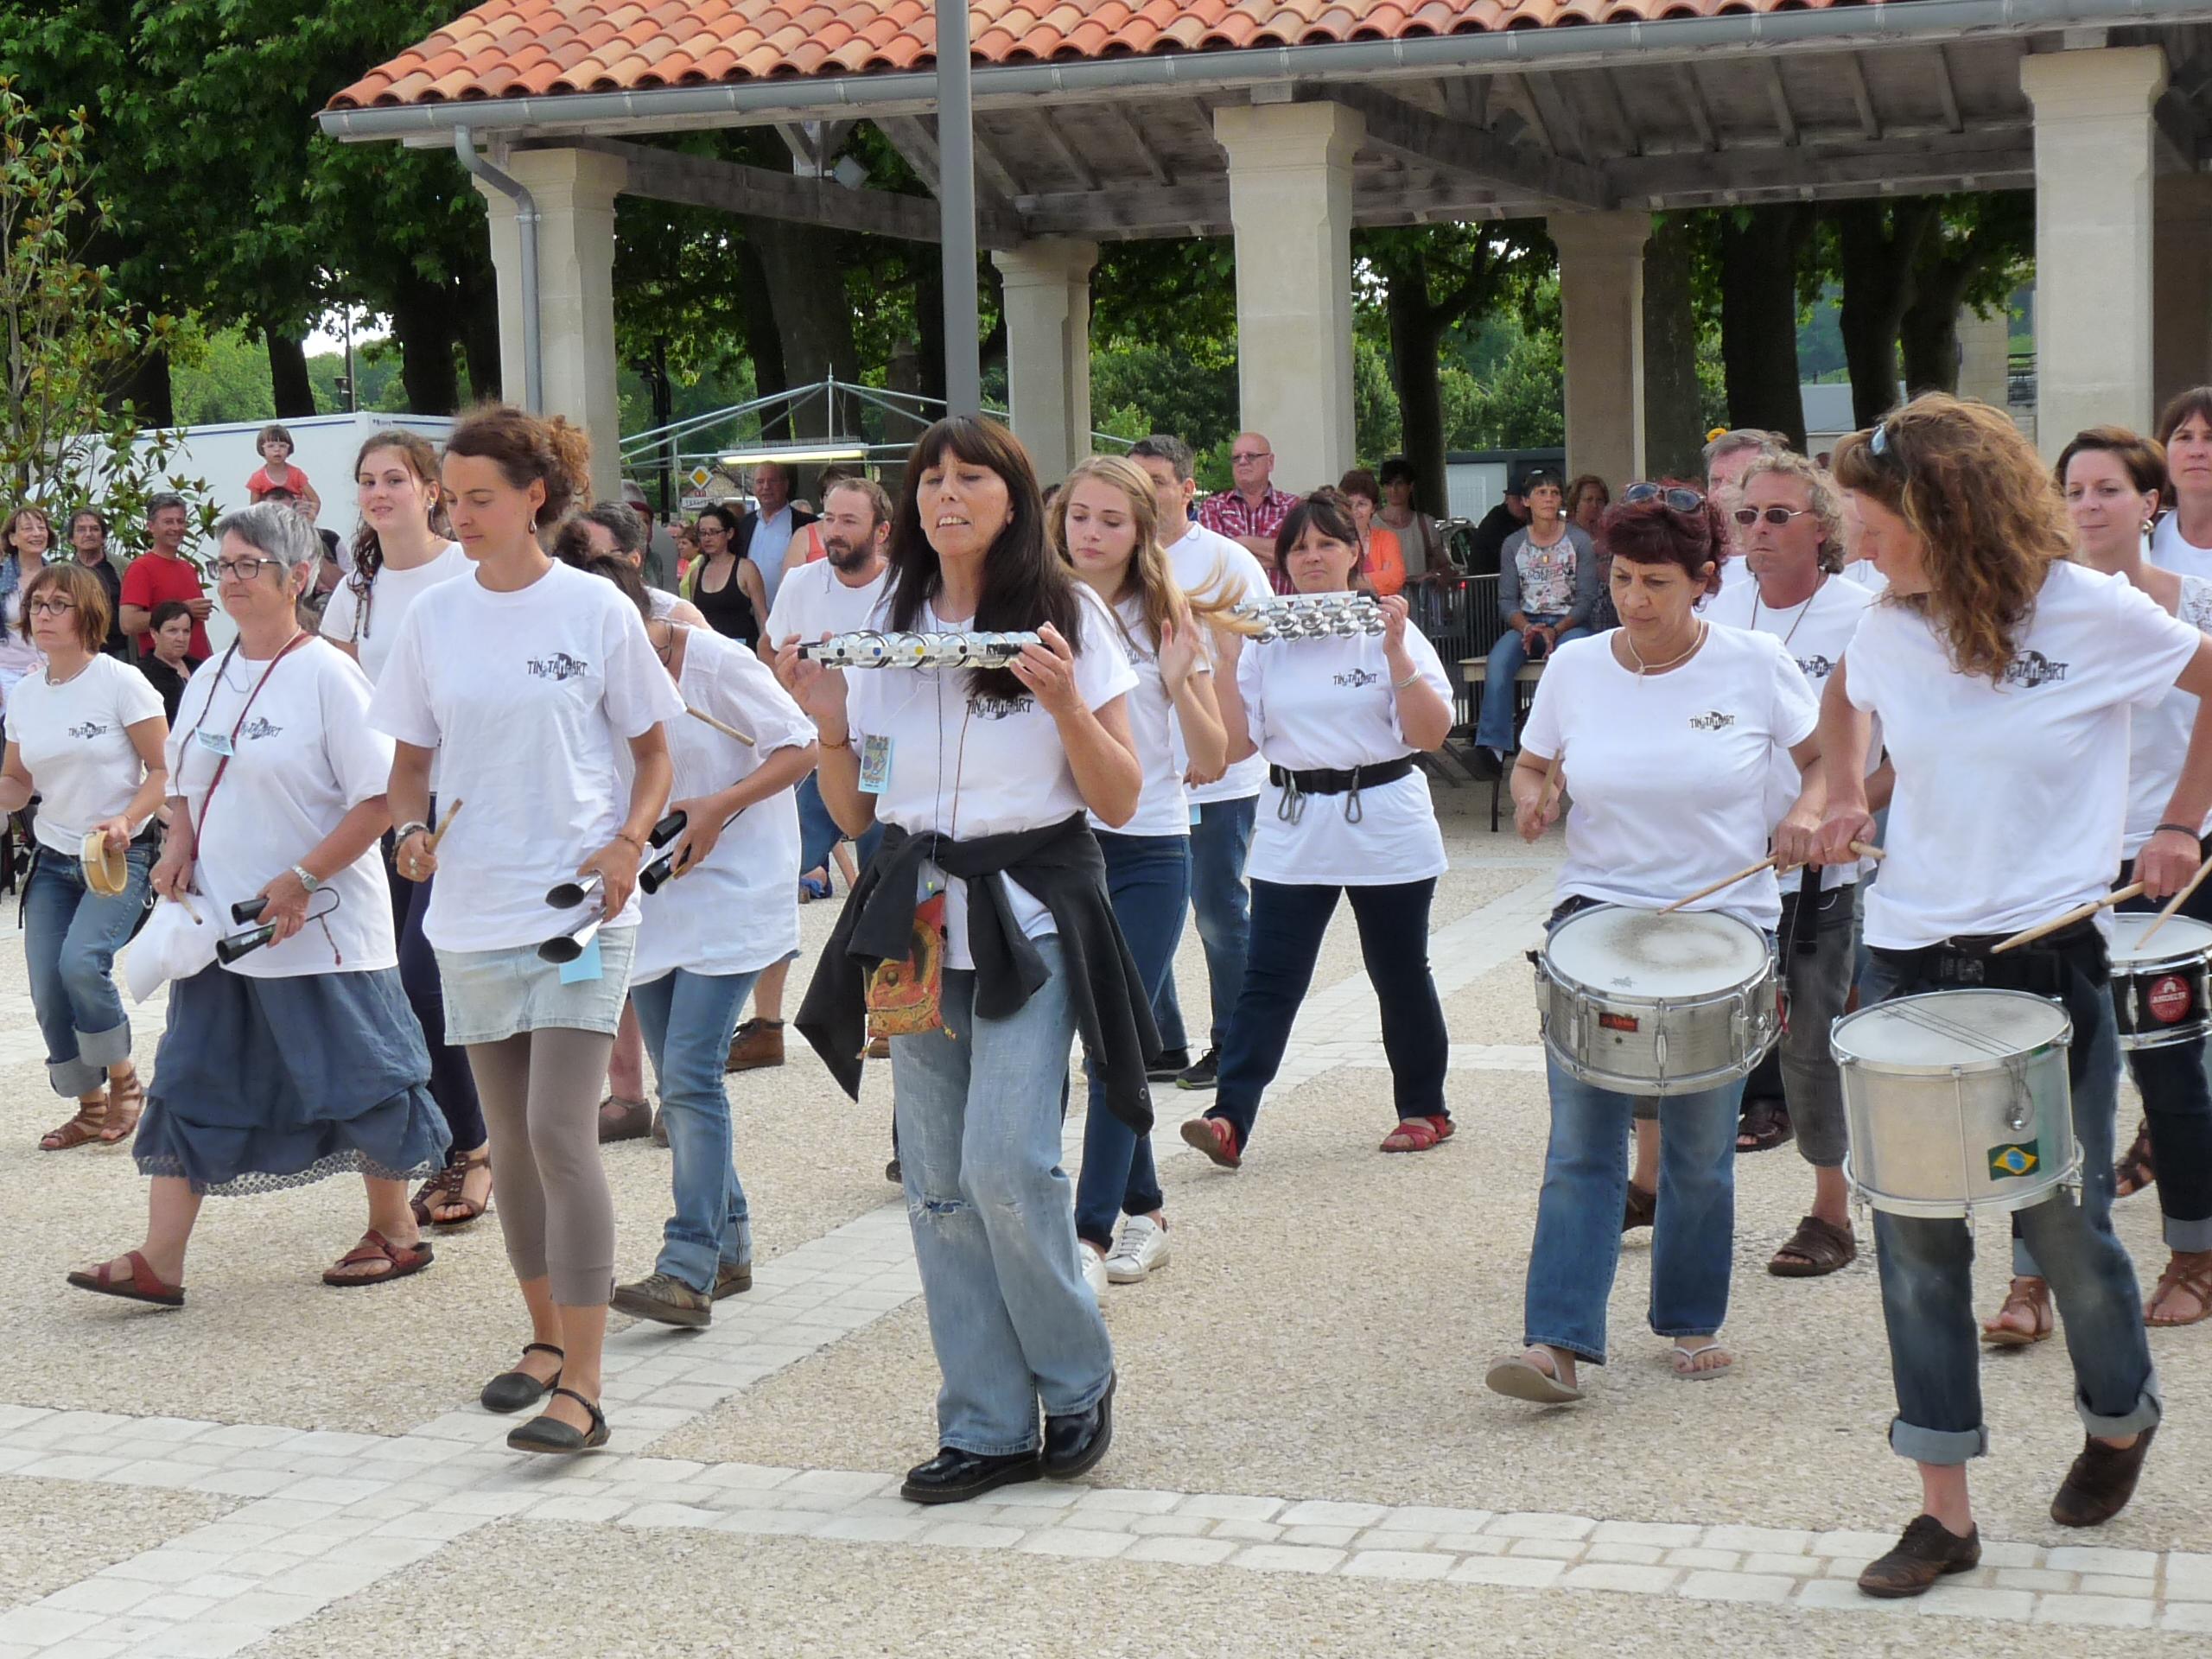 Les Fêtes de la Musique avec Samba d'Oc !!!